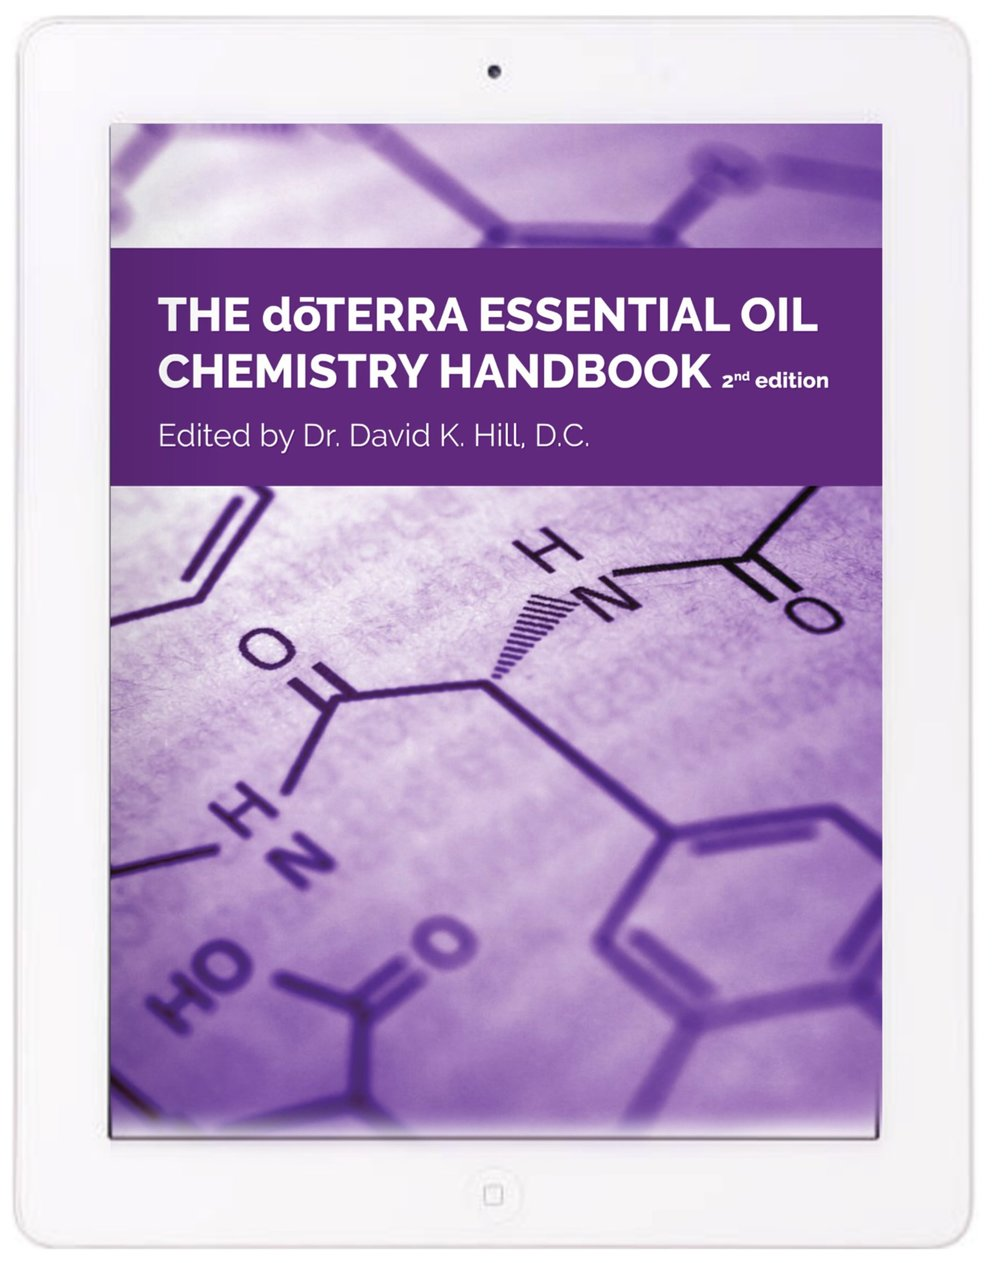 doTERRA chemistry (free)